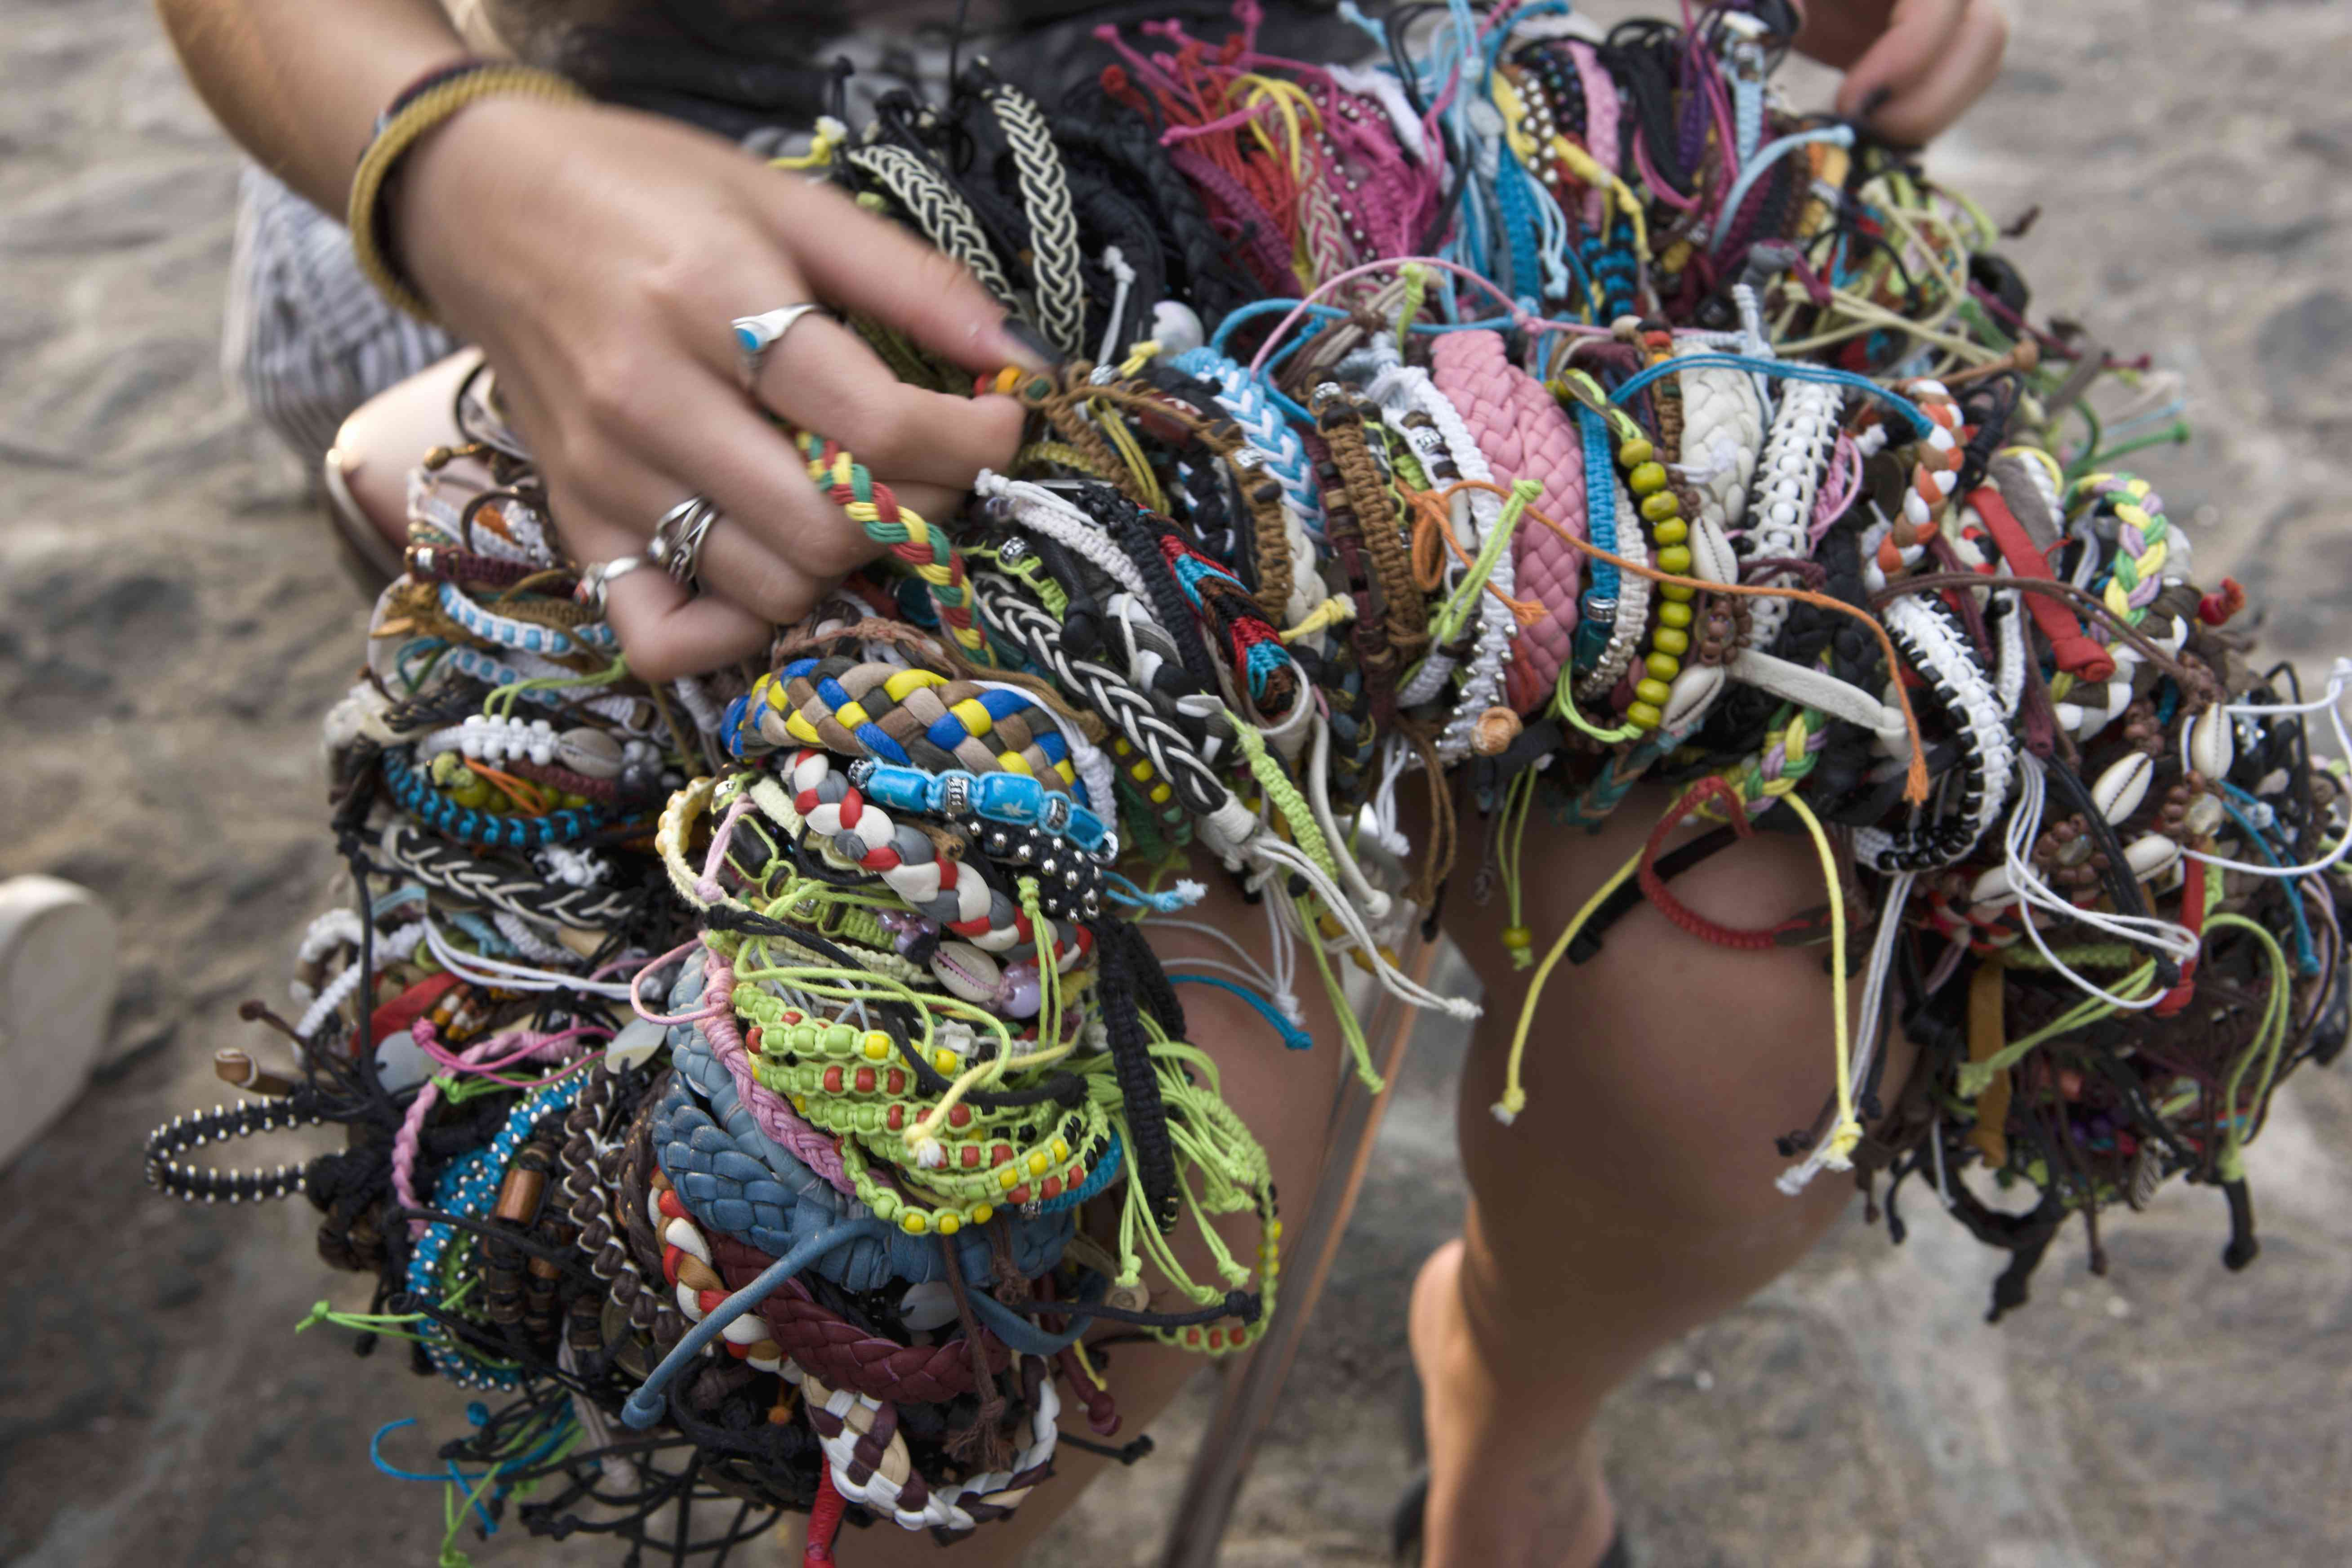 Bracelets for sale on a Bali beach